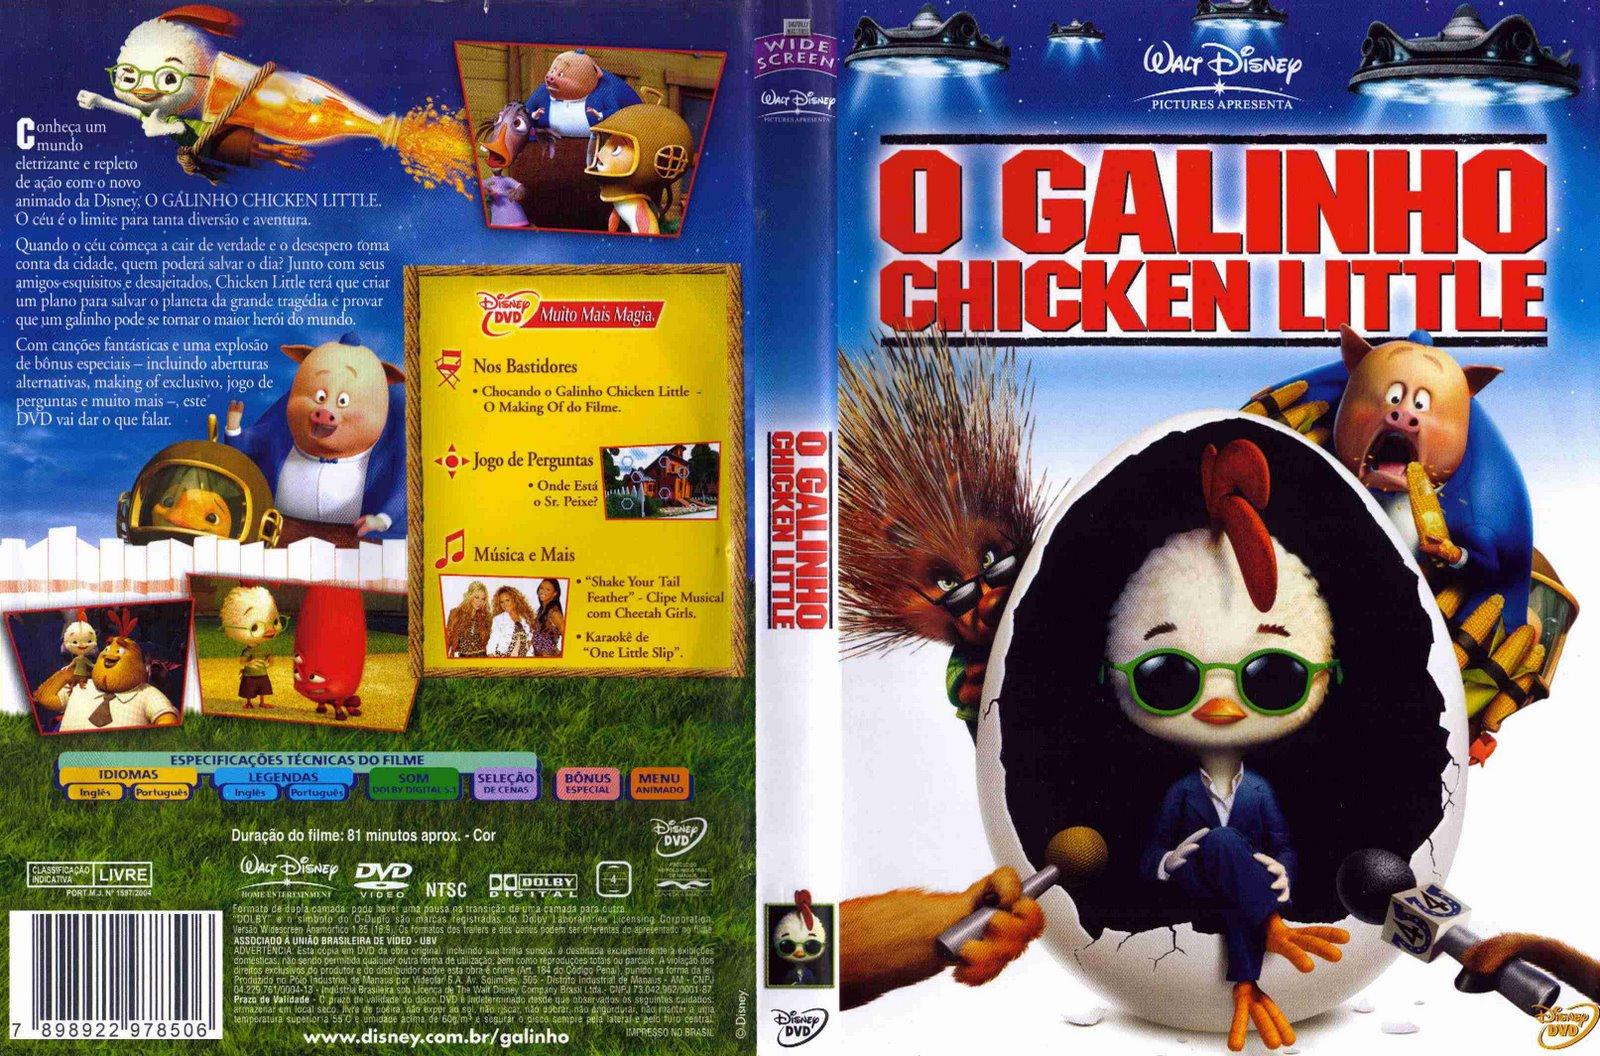 O Galinho Chicken Little Visitem Www Coversblog Com Br